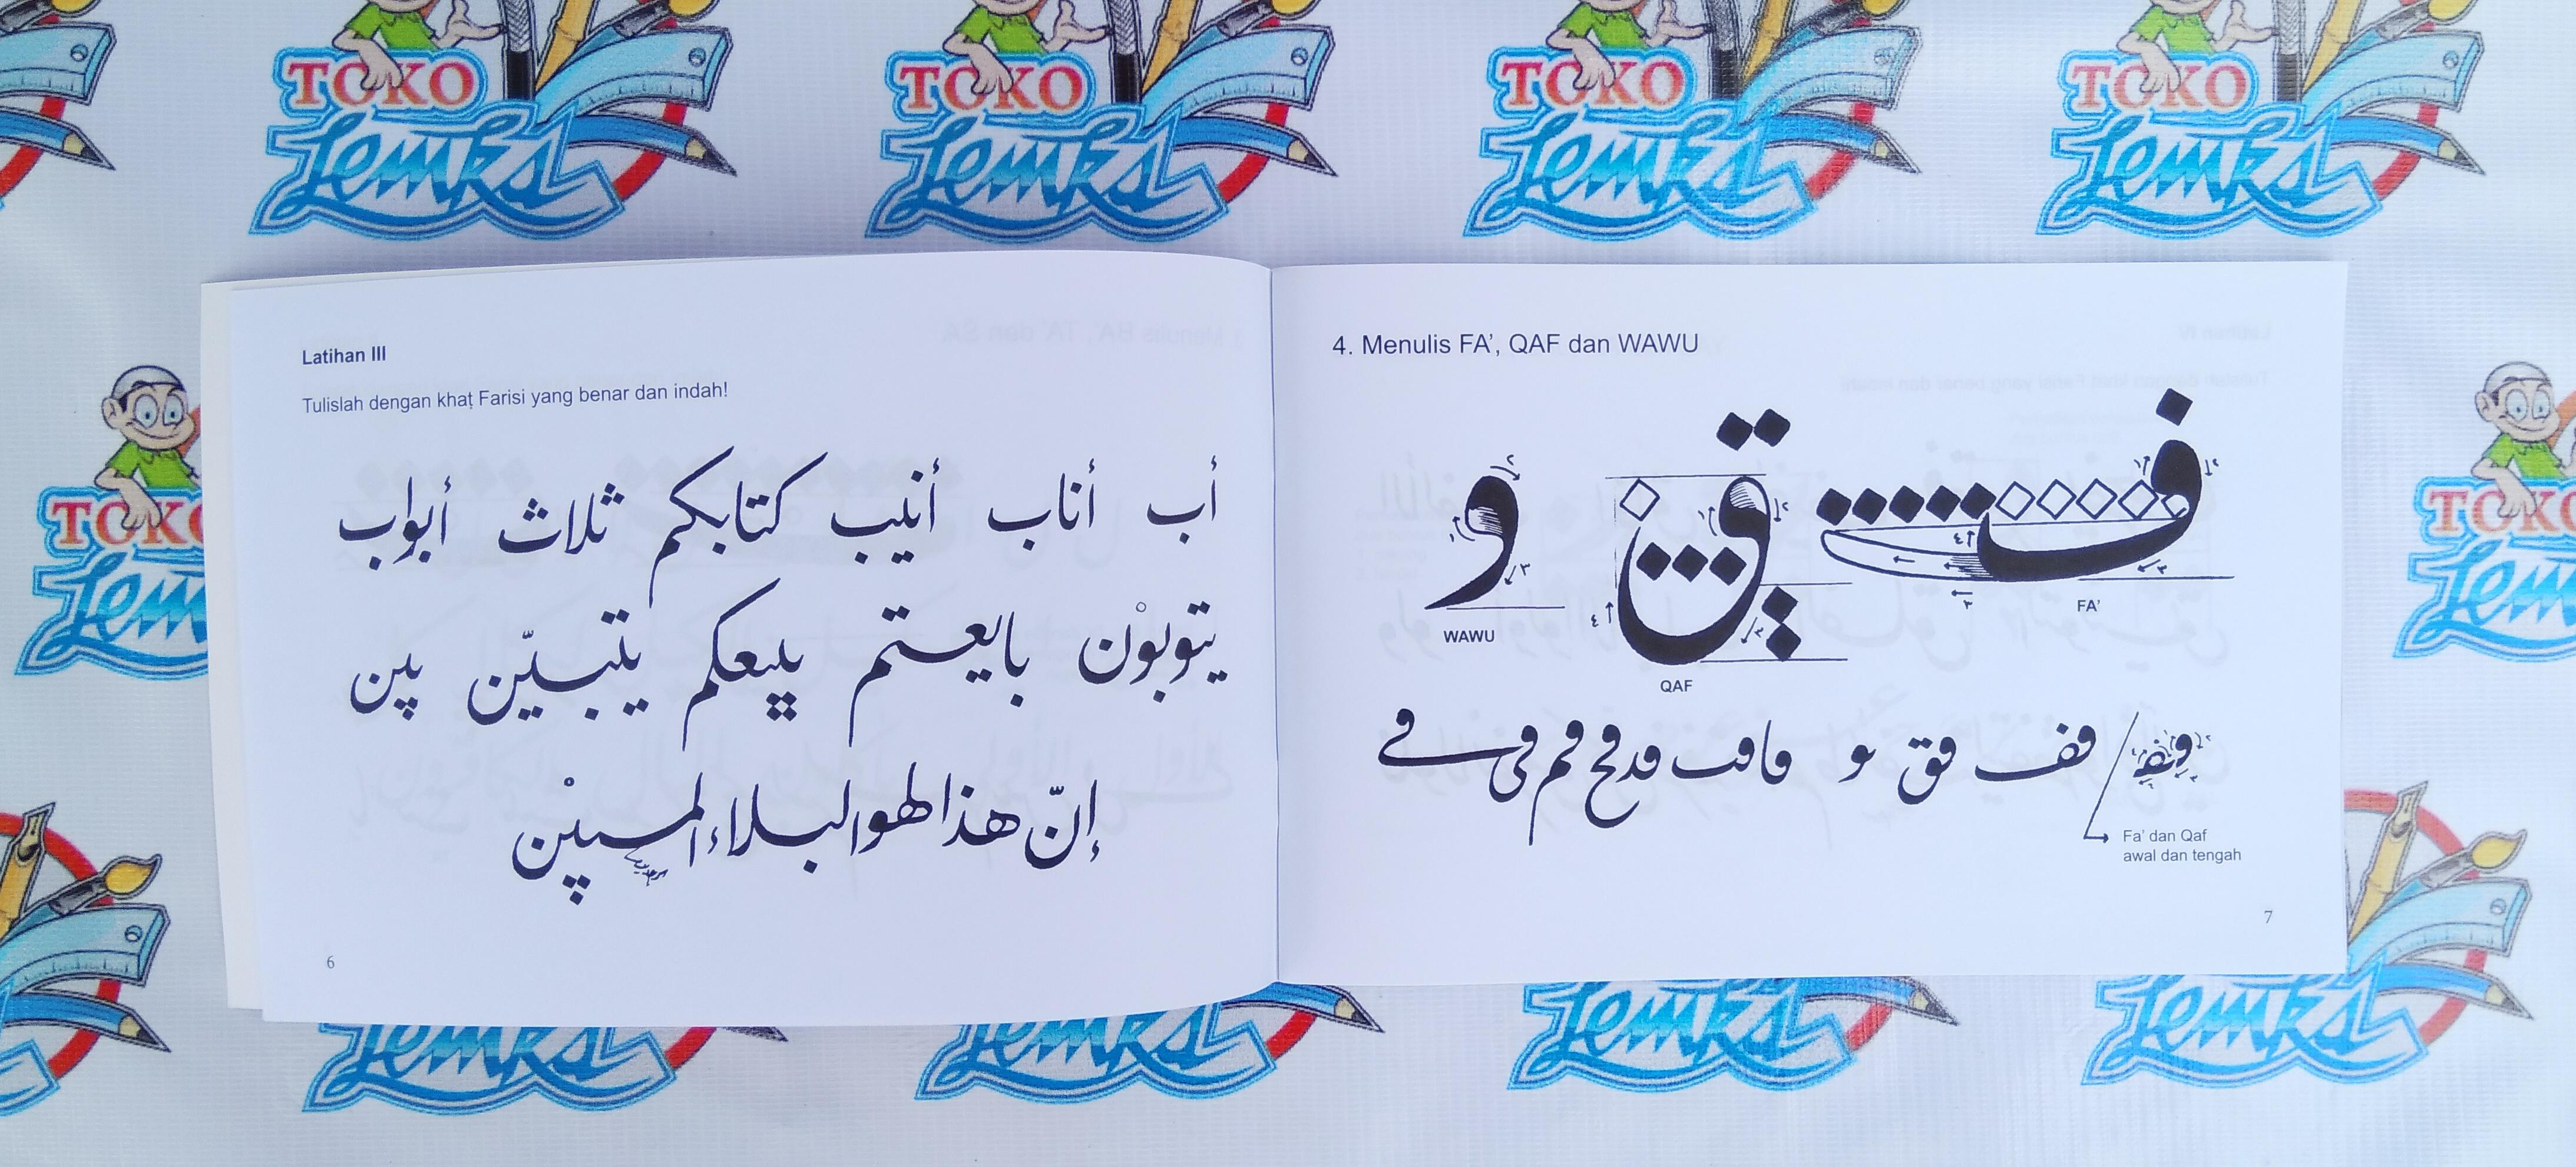 Buku Qoedah Kaligrafi Kaidah Kaligrafi Buku Kaligrafi Buku